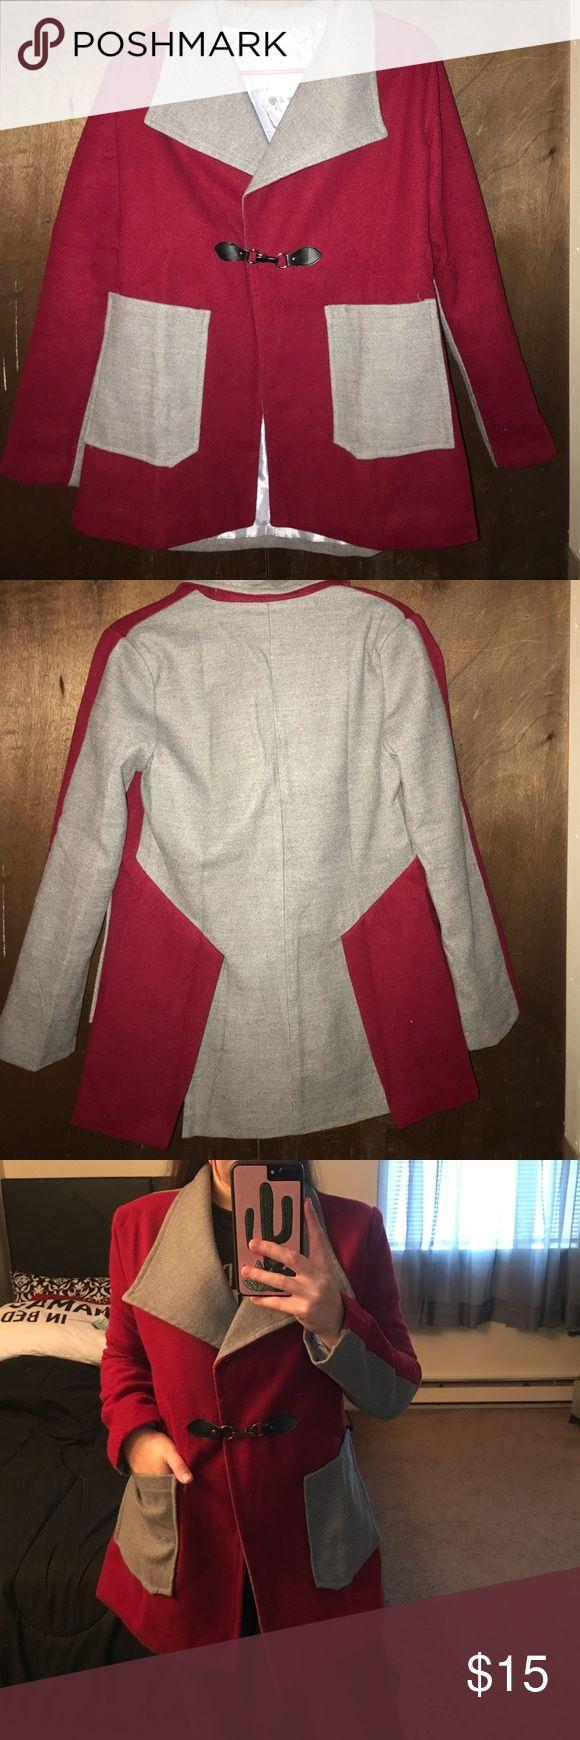 Red/ grey pea coat Red and grey Small Jackets & Coats Pea Coats